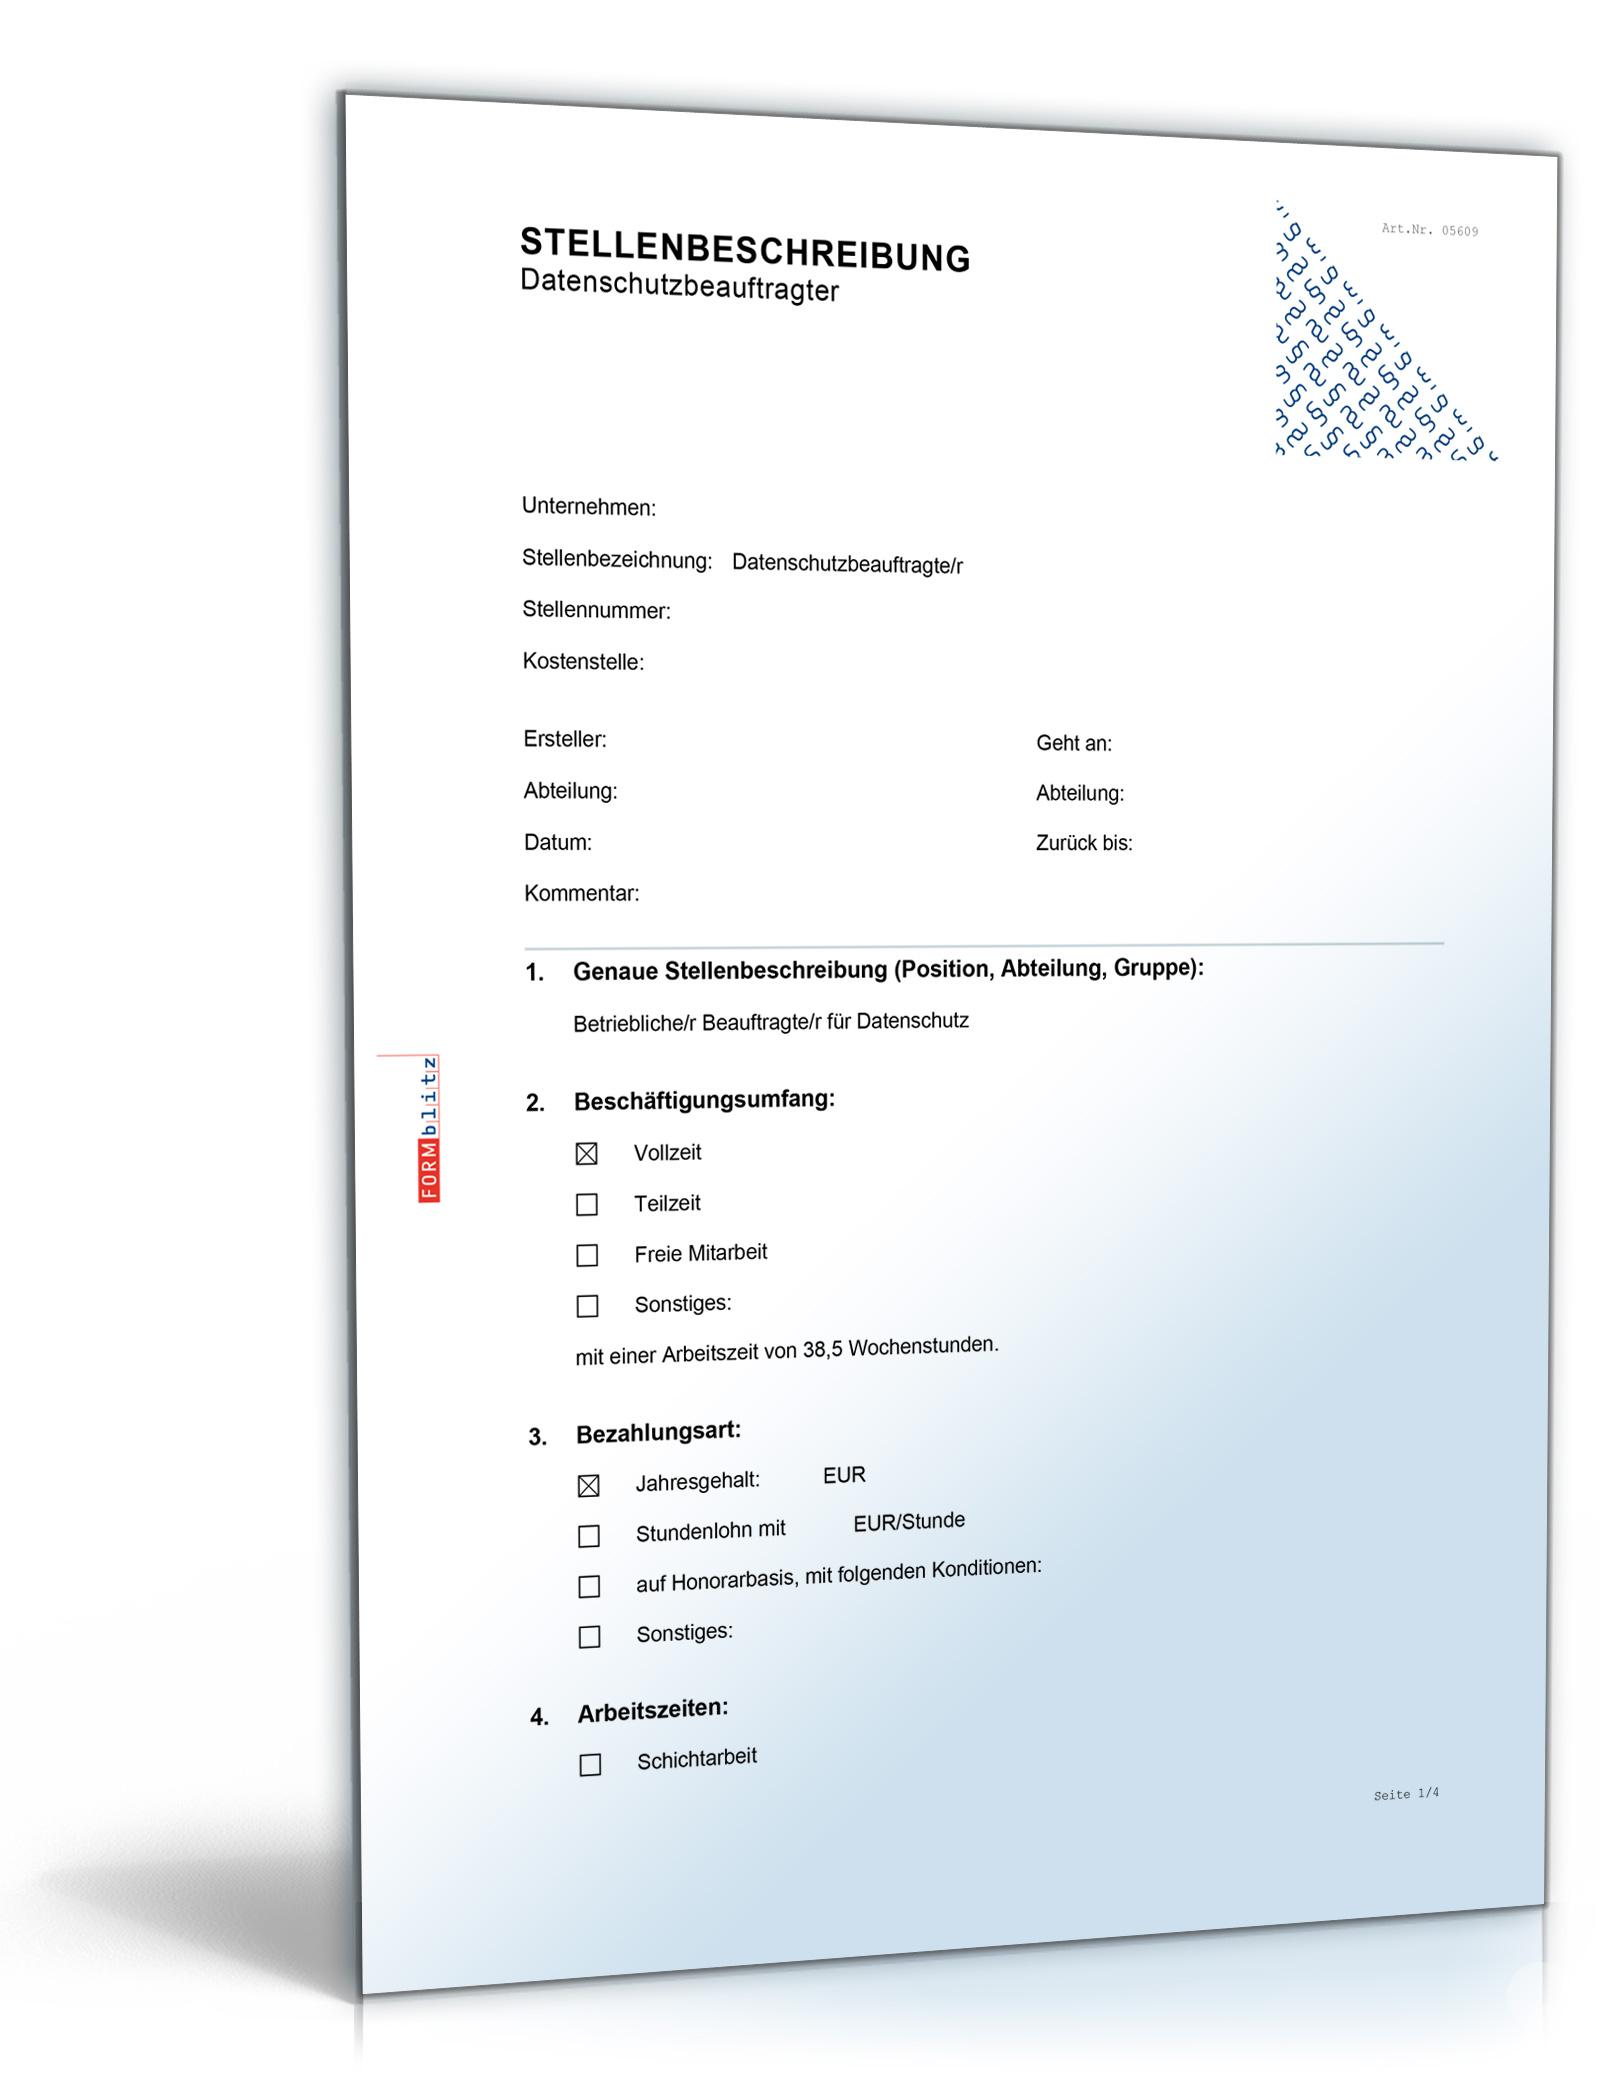 Stellenbeschreibung Datenschutzbeauftragte/r